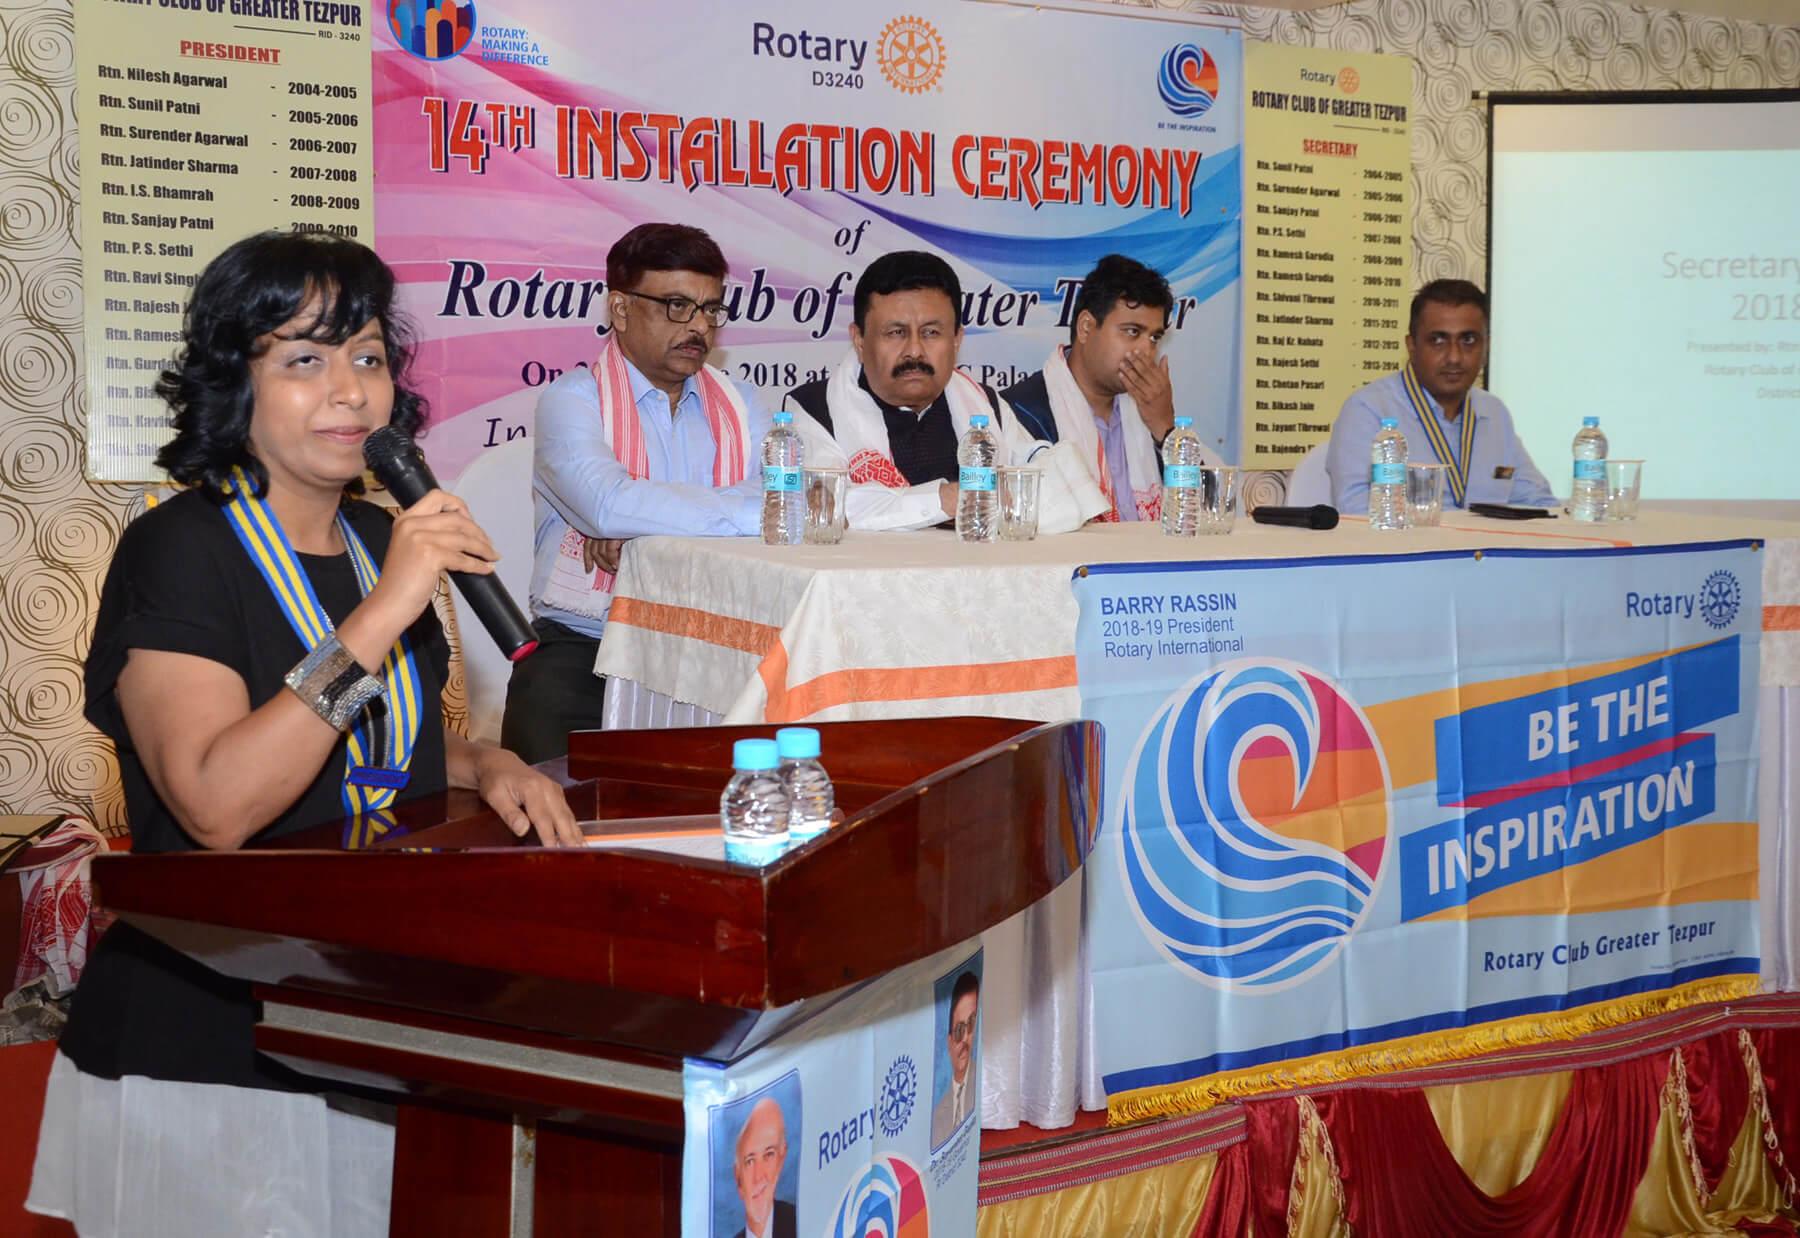 49th installation ceremony of Rotary Club Tinsukia